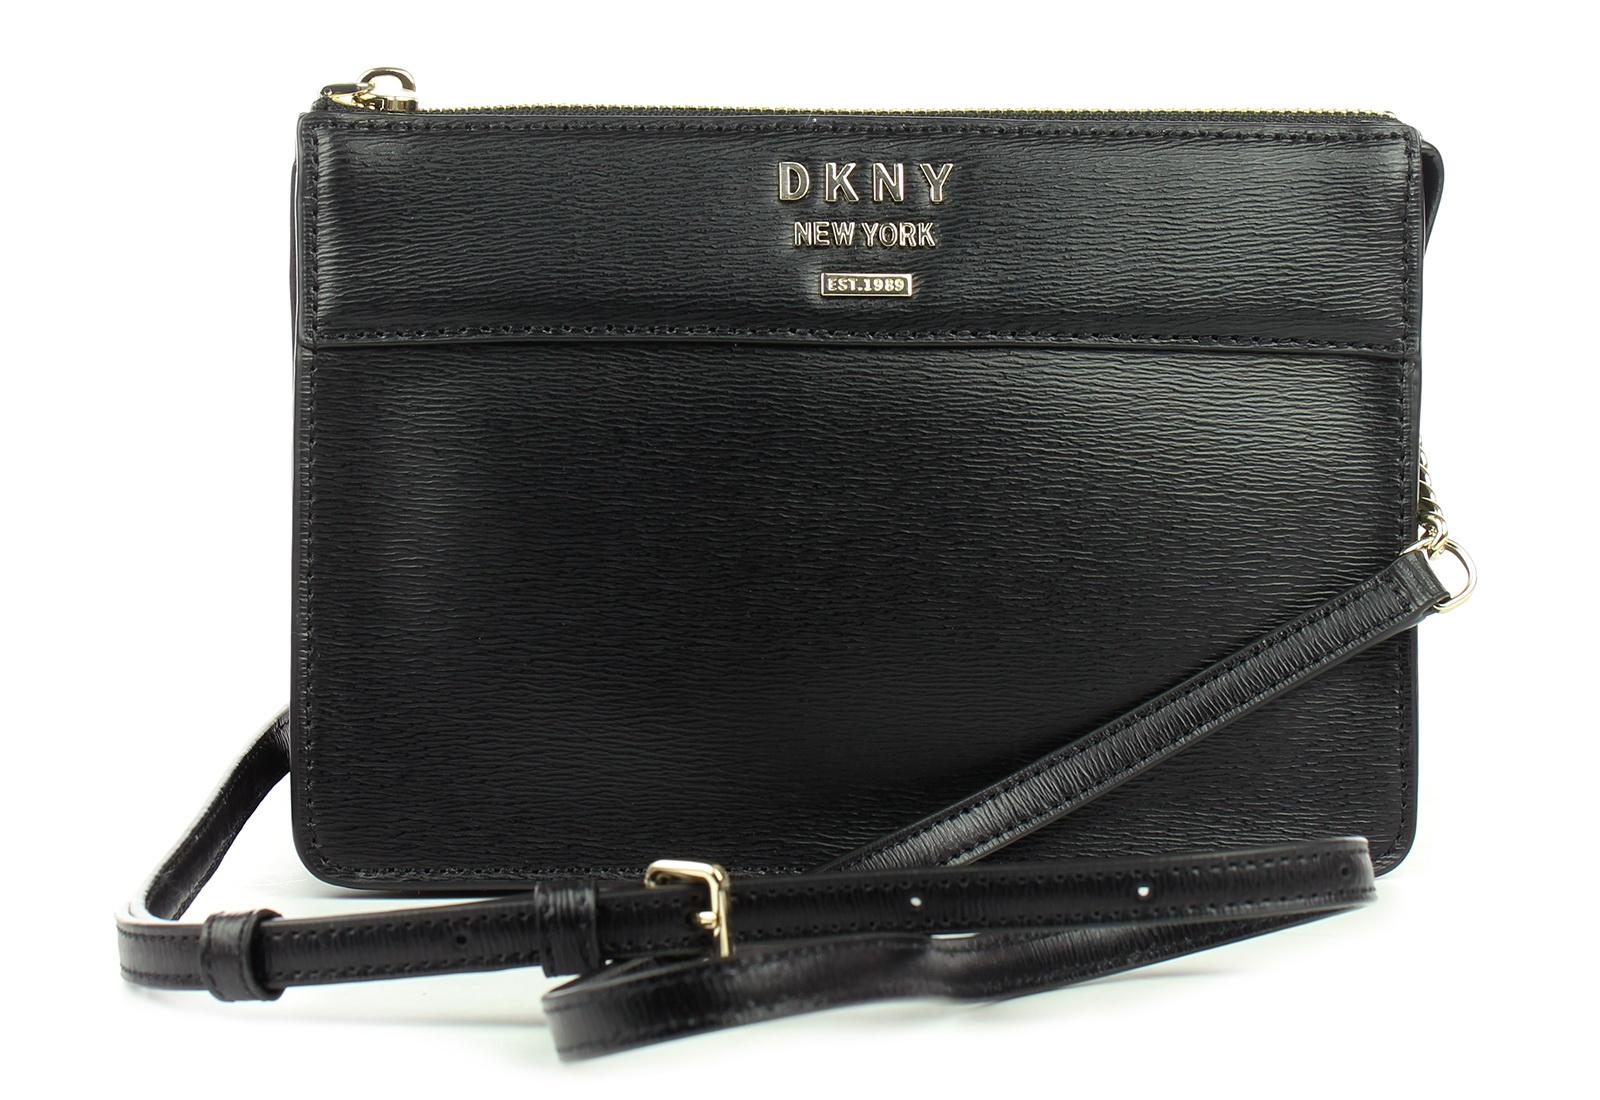 DKNY Kabelky Ava - Top Zip Crossbody